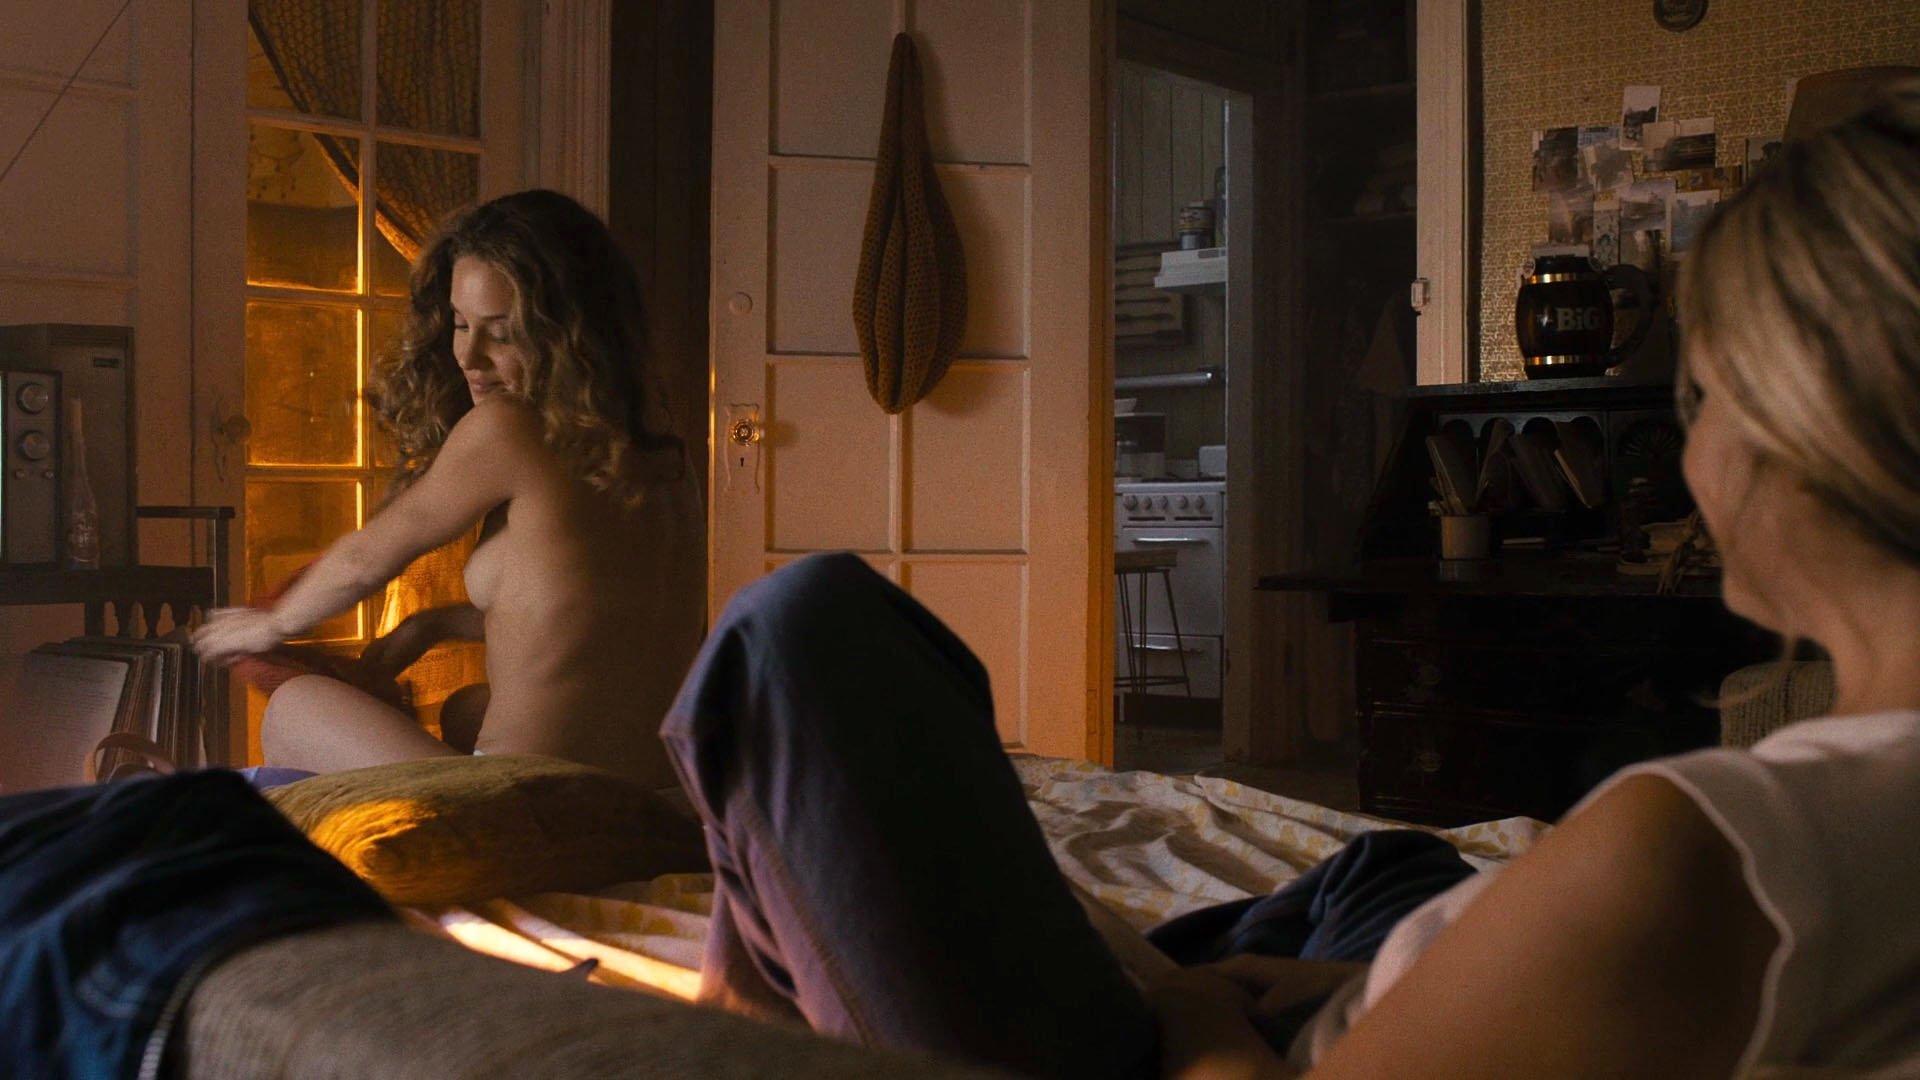 Margarita Levieva nude - The Deuce s01e07 (2017)